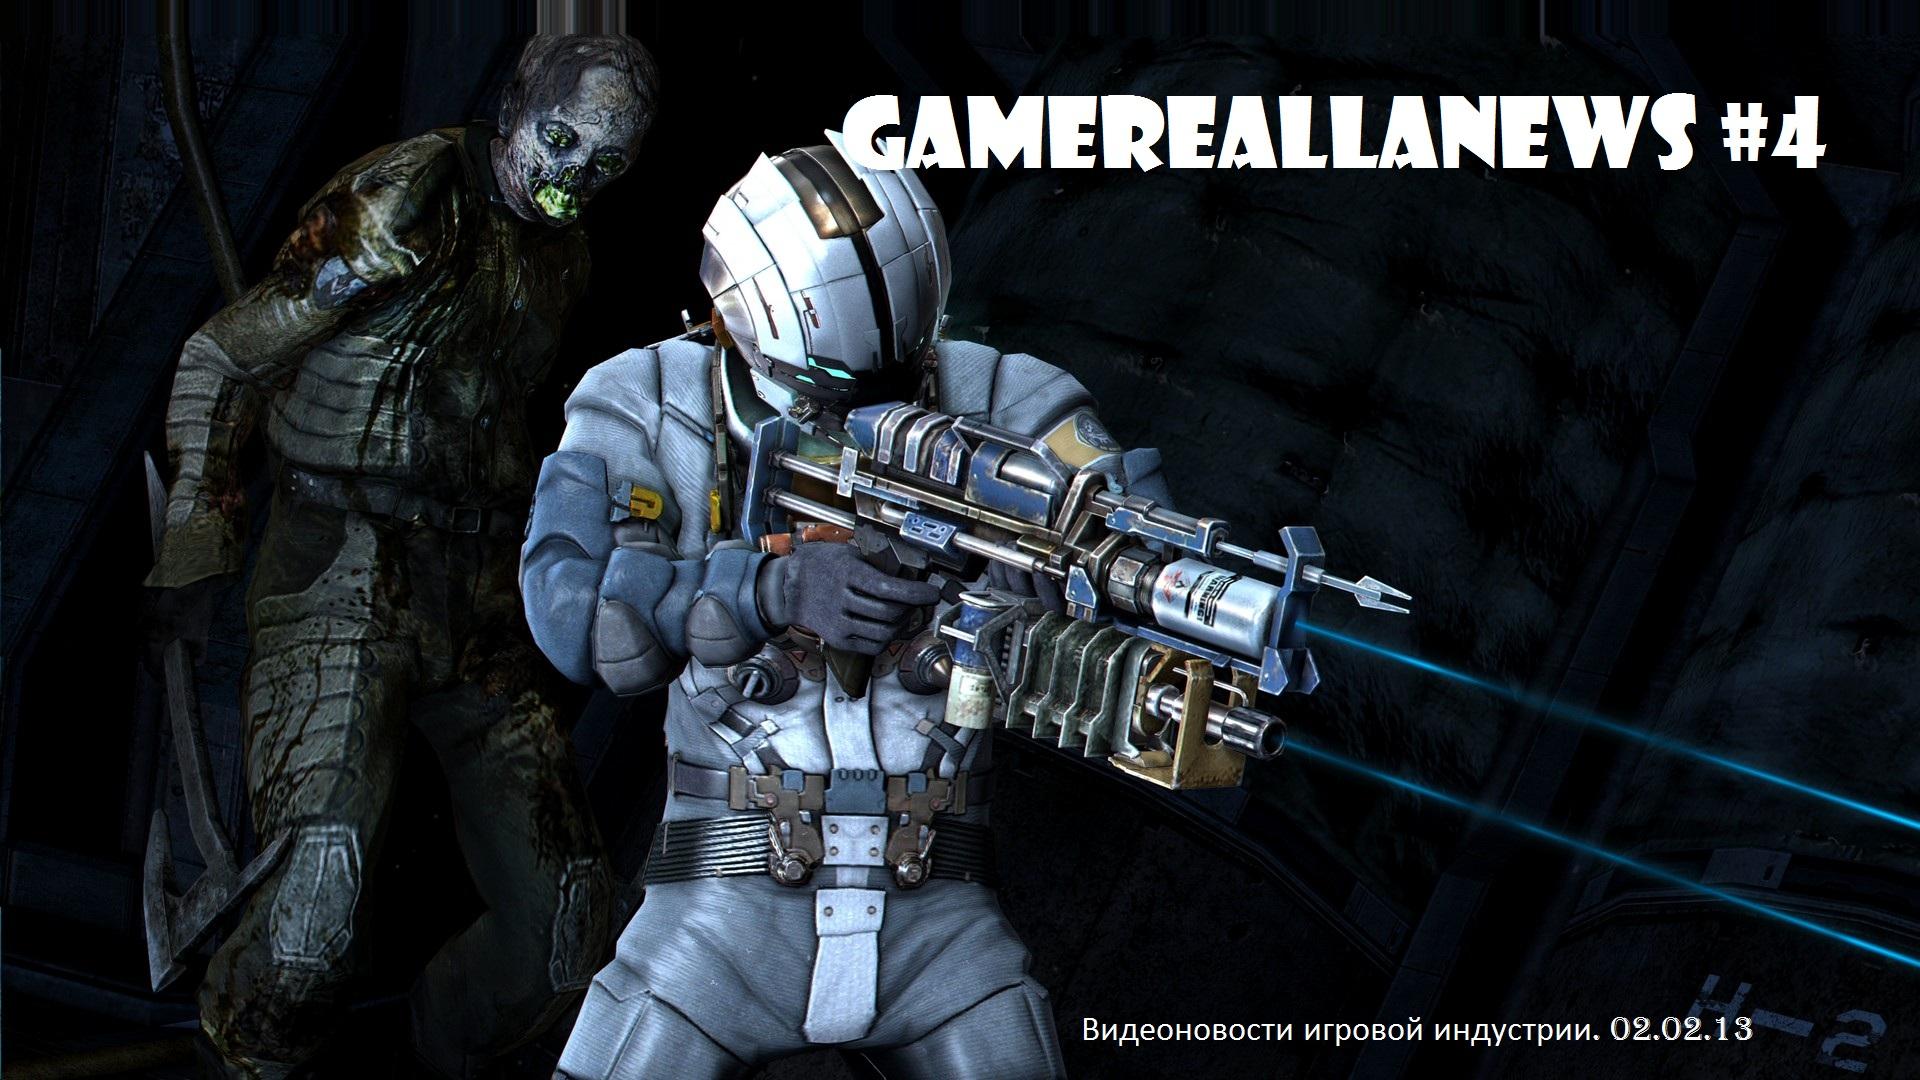 gamereallanews 4